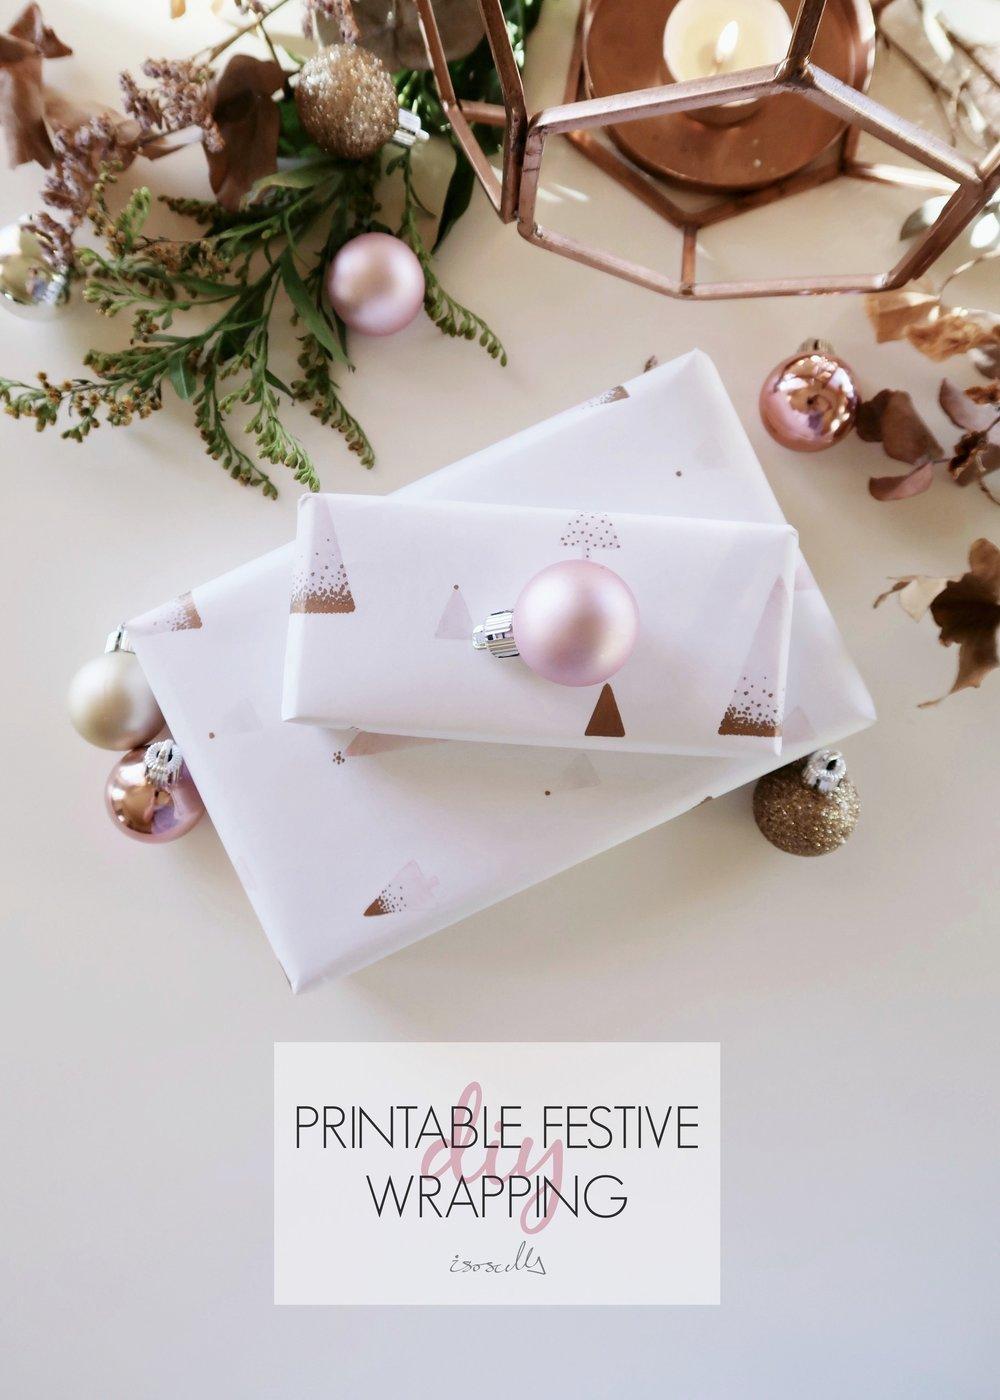 DIY Printable Festive Wrapping by Isoscella